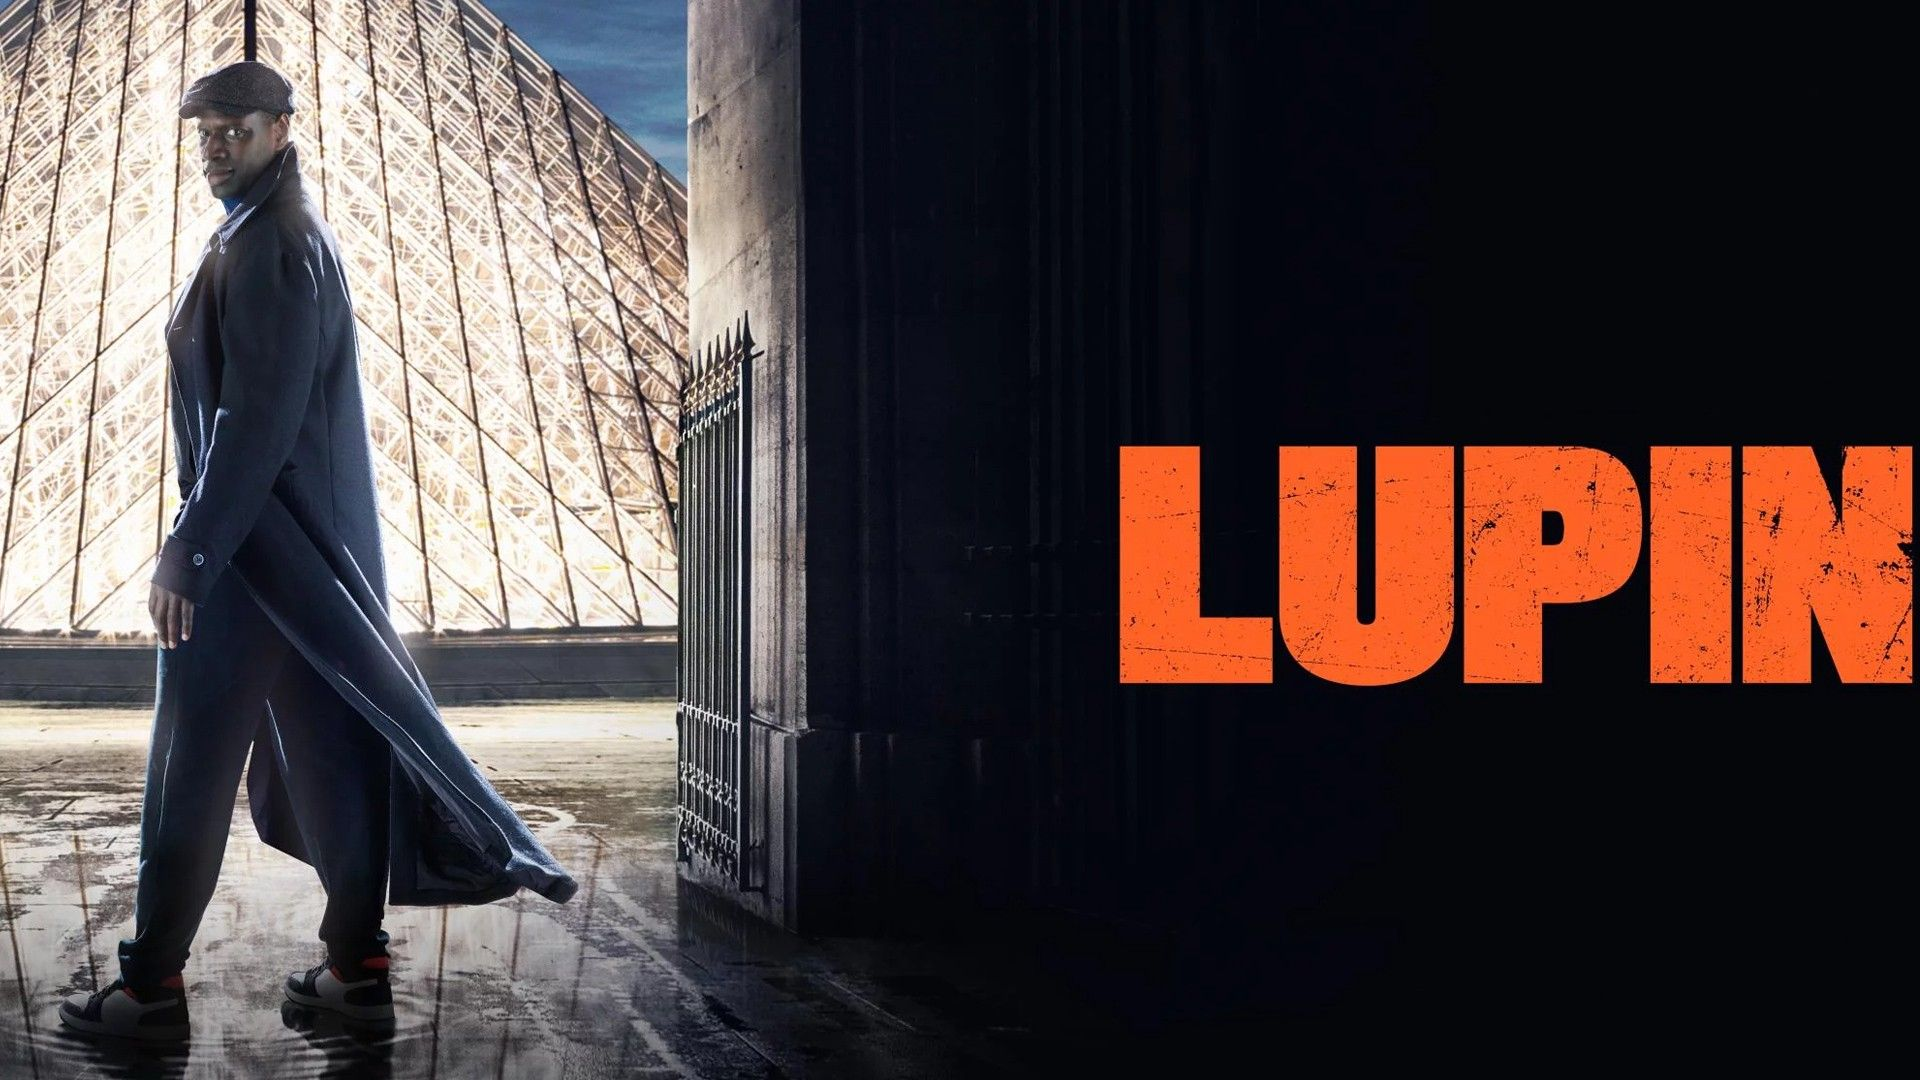 Lupin・AppleTV (Netflix)